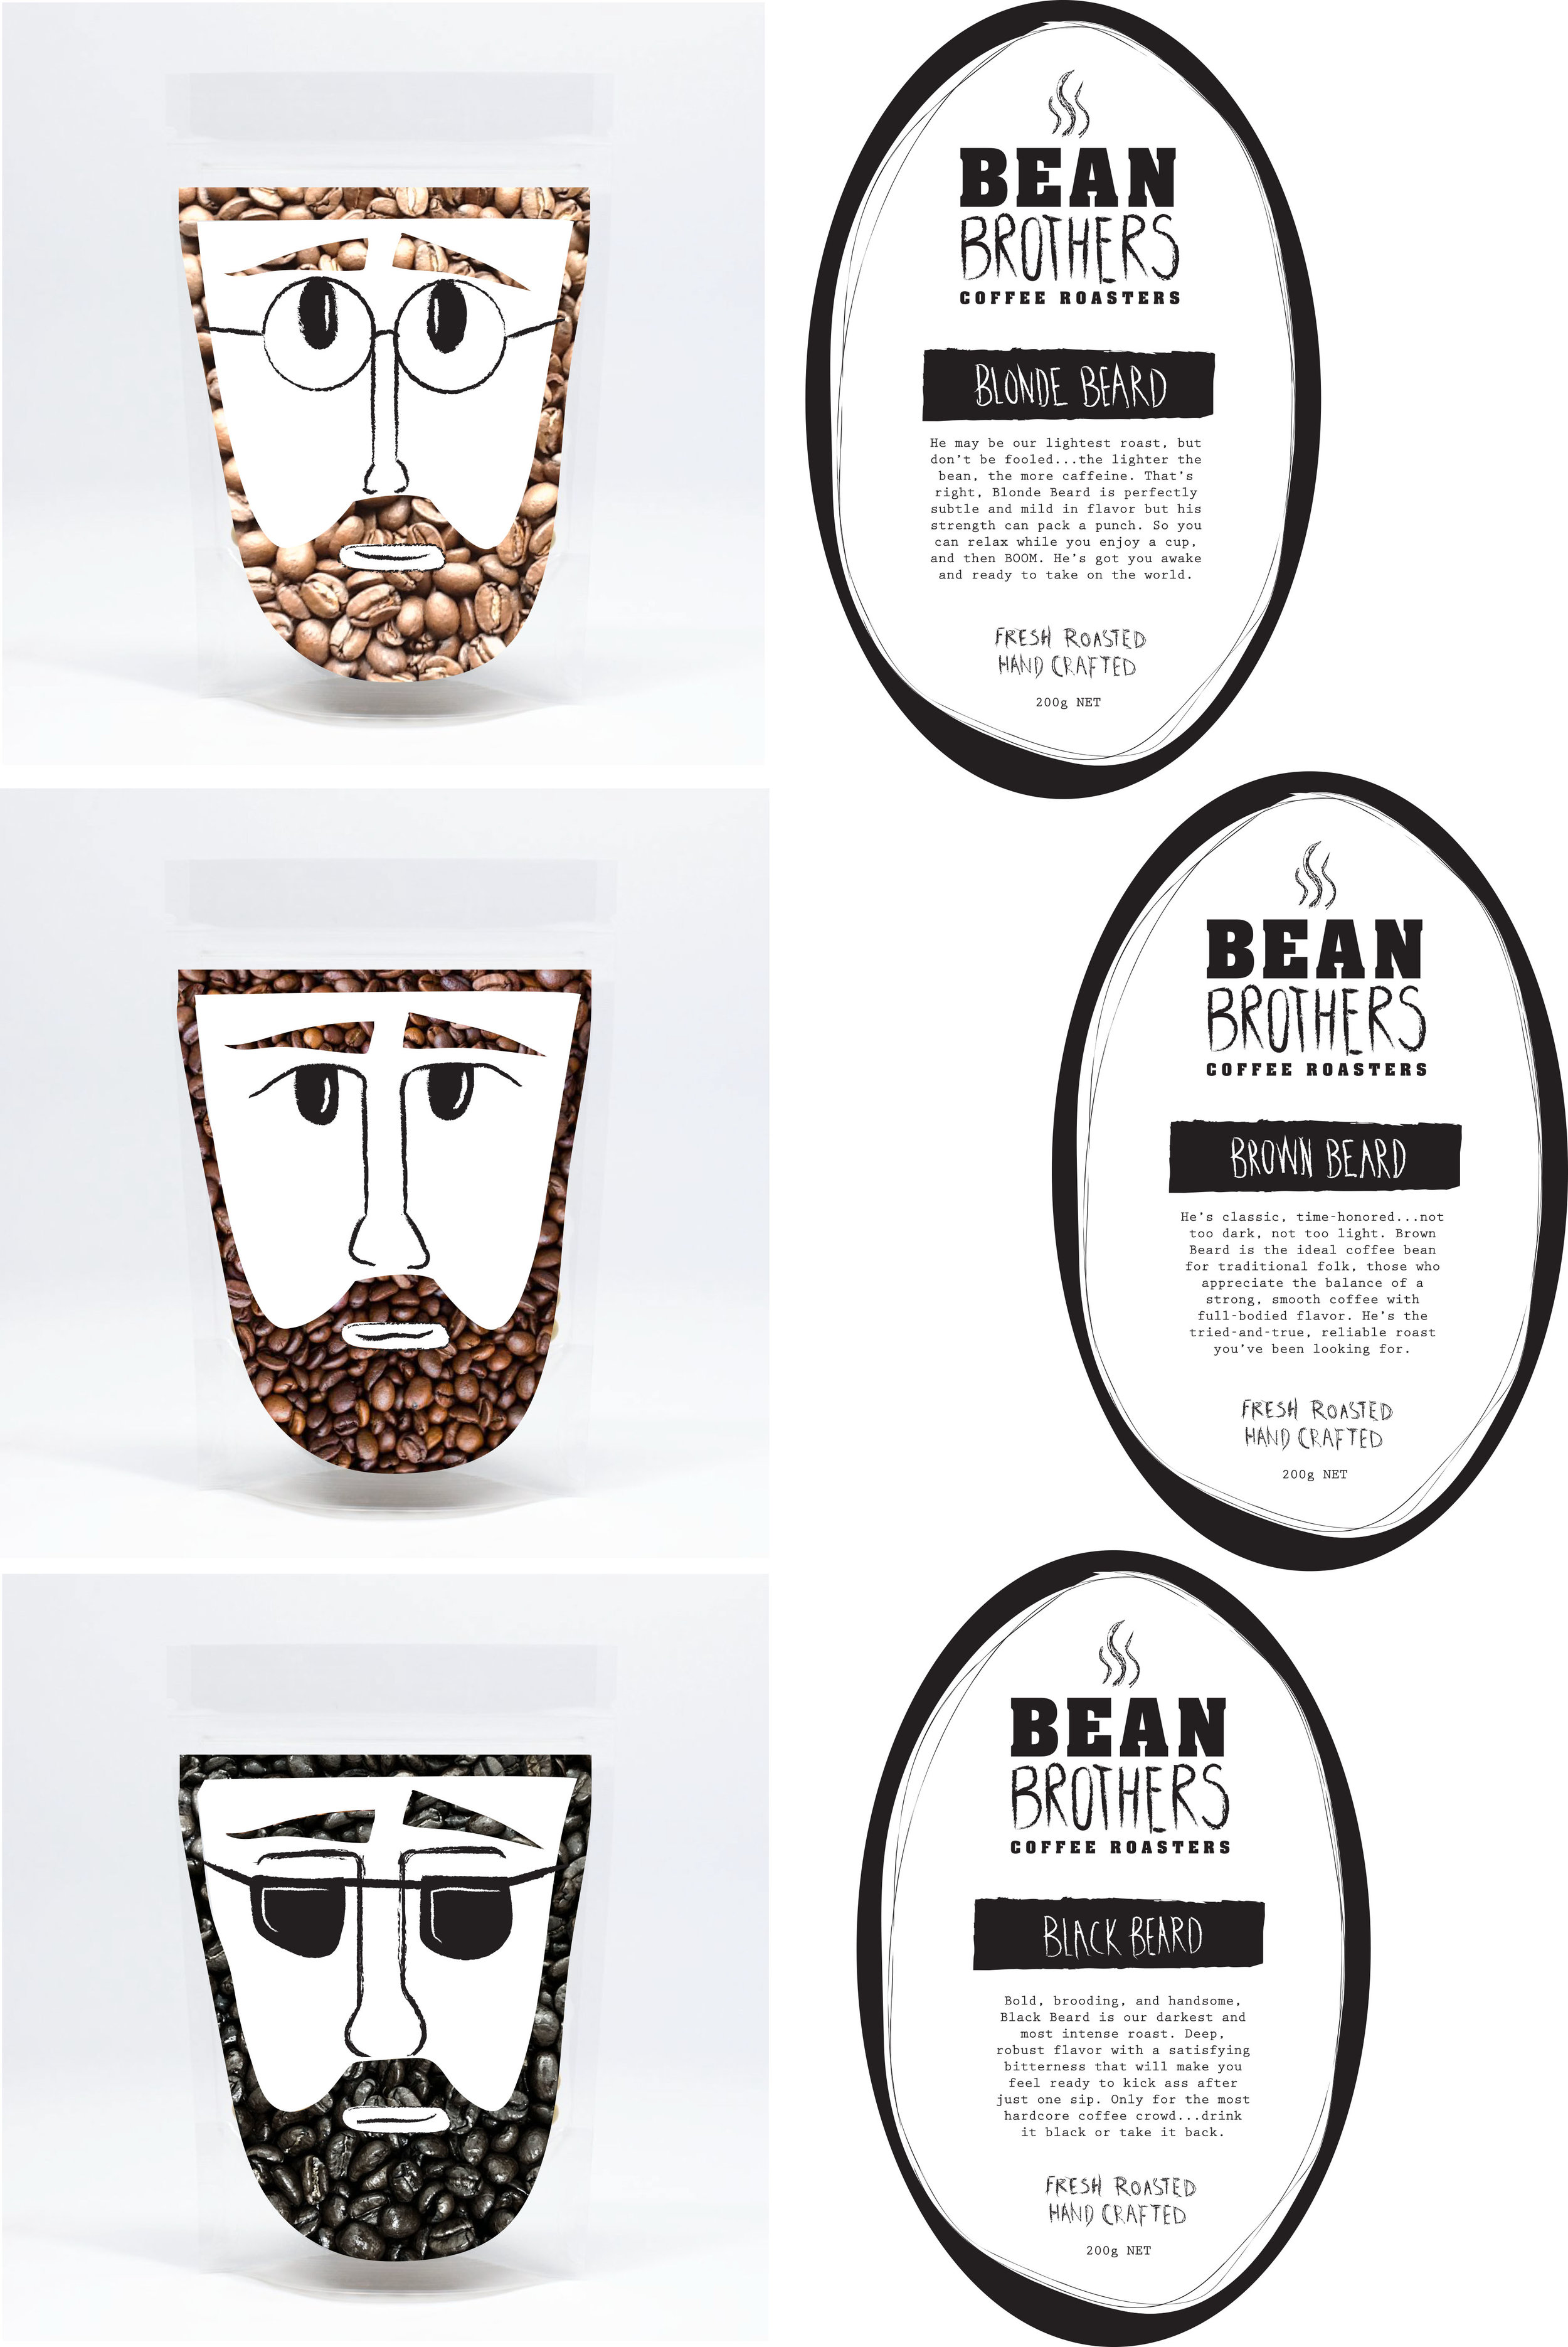 BeanBrothersFinalDesign.jpg